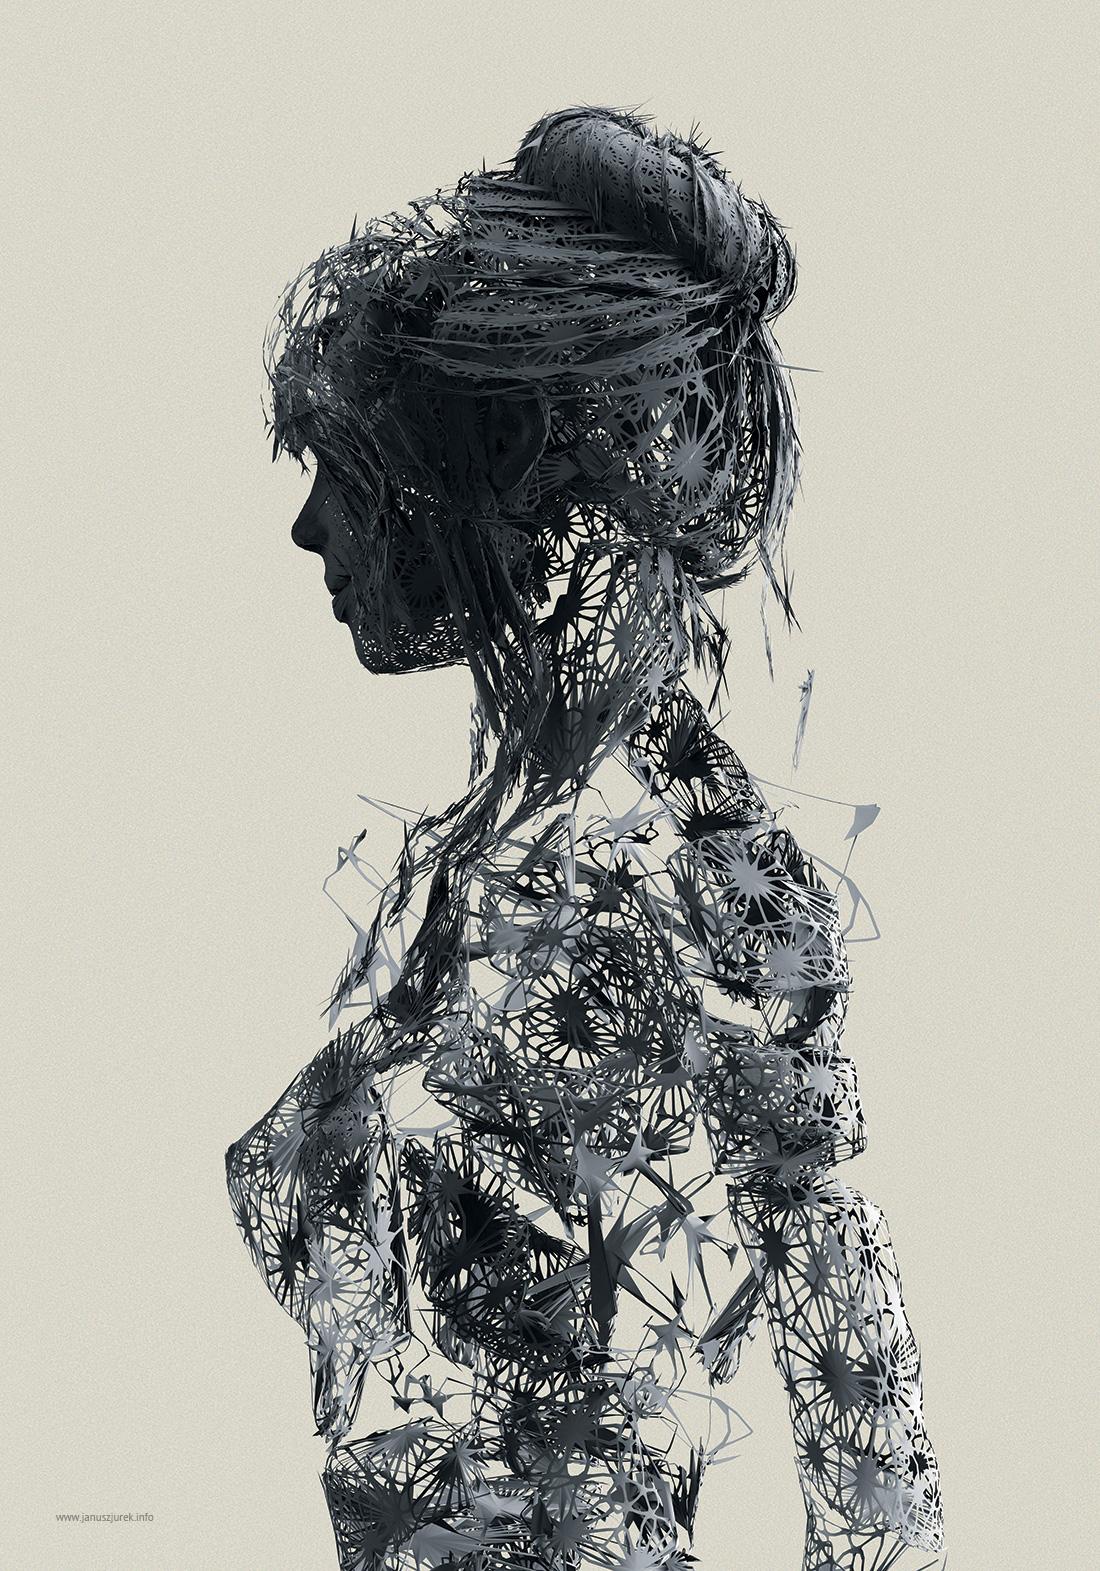 Femme de métal © Janusz Jurek